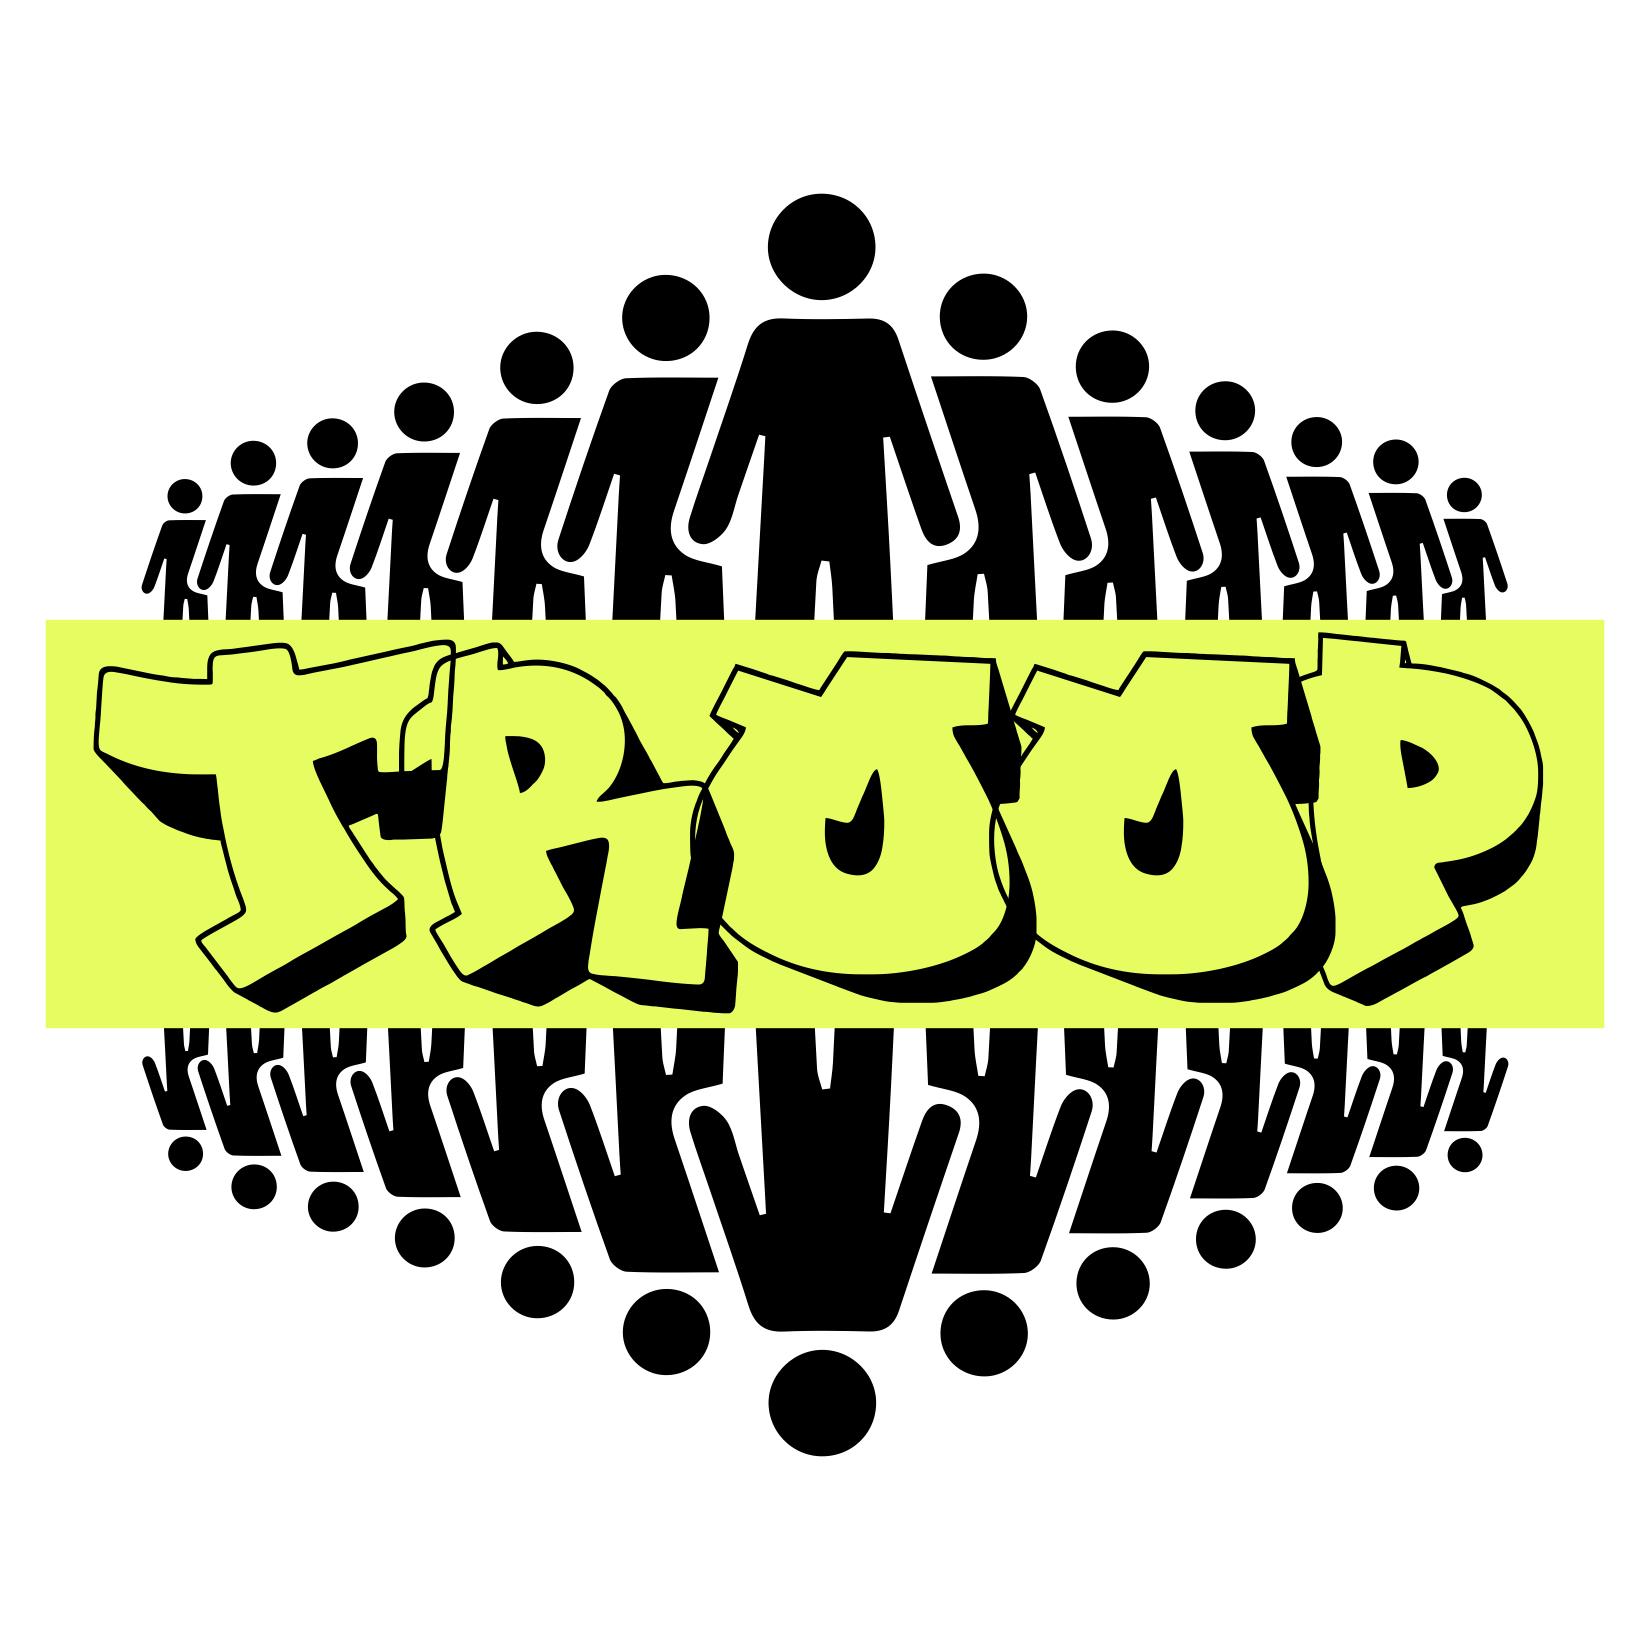 T.ROOP